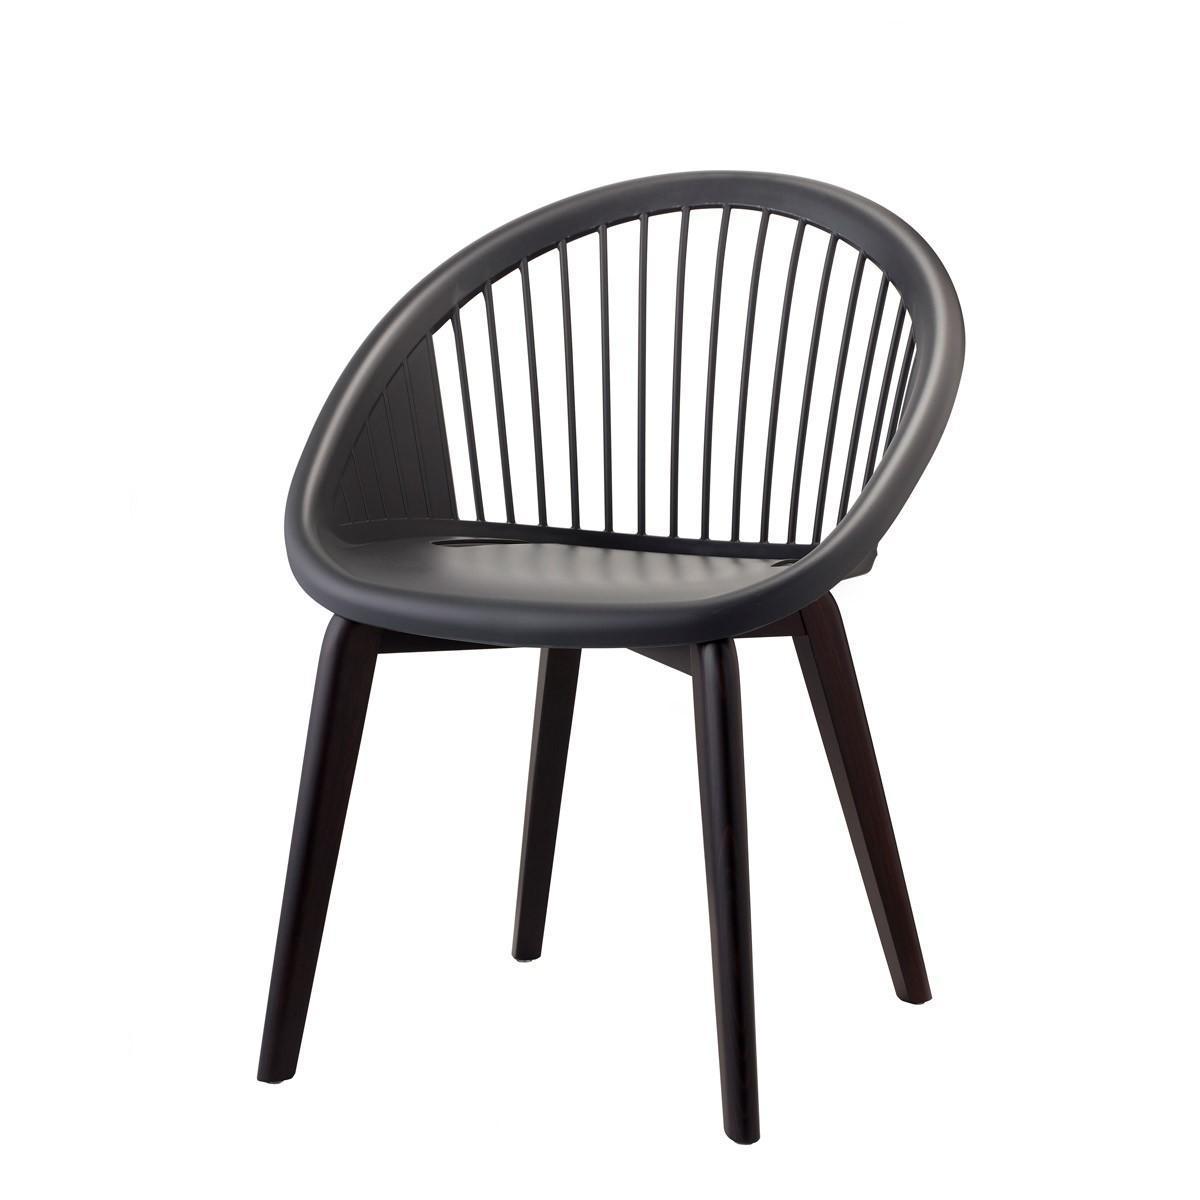 Кресло пластиковое Natural Giulia solid wood frame